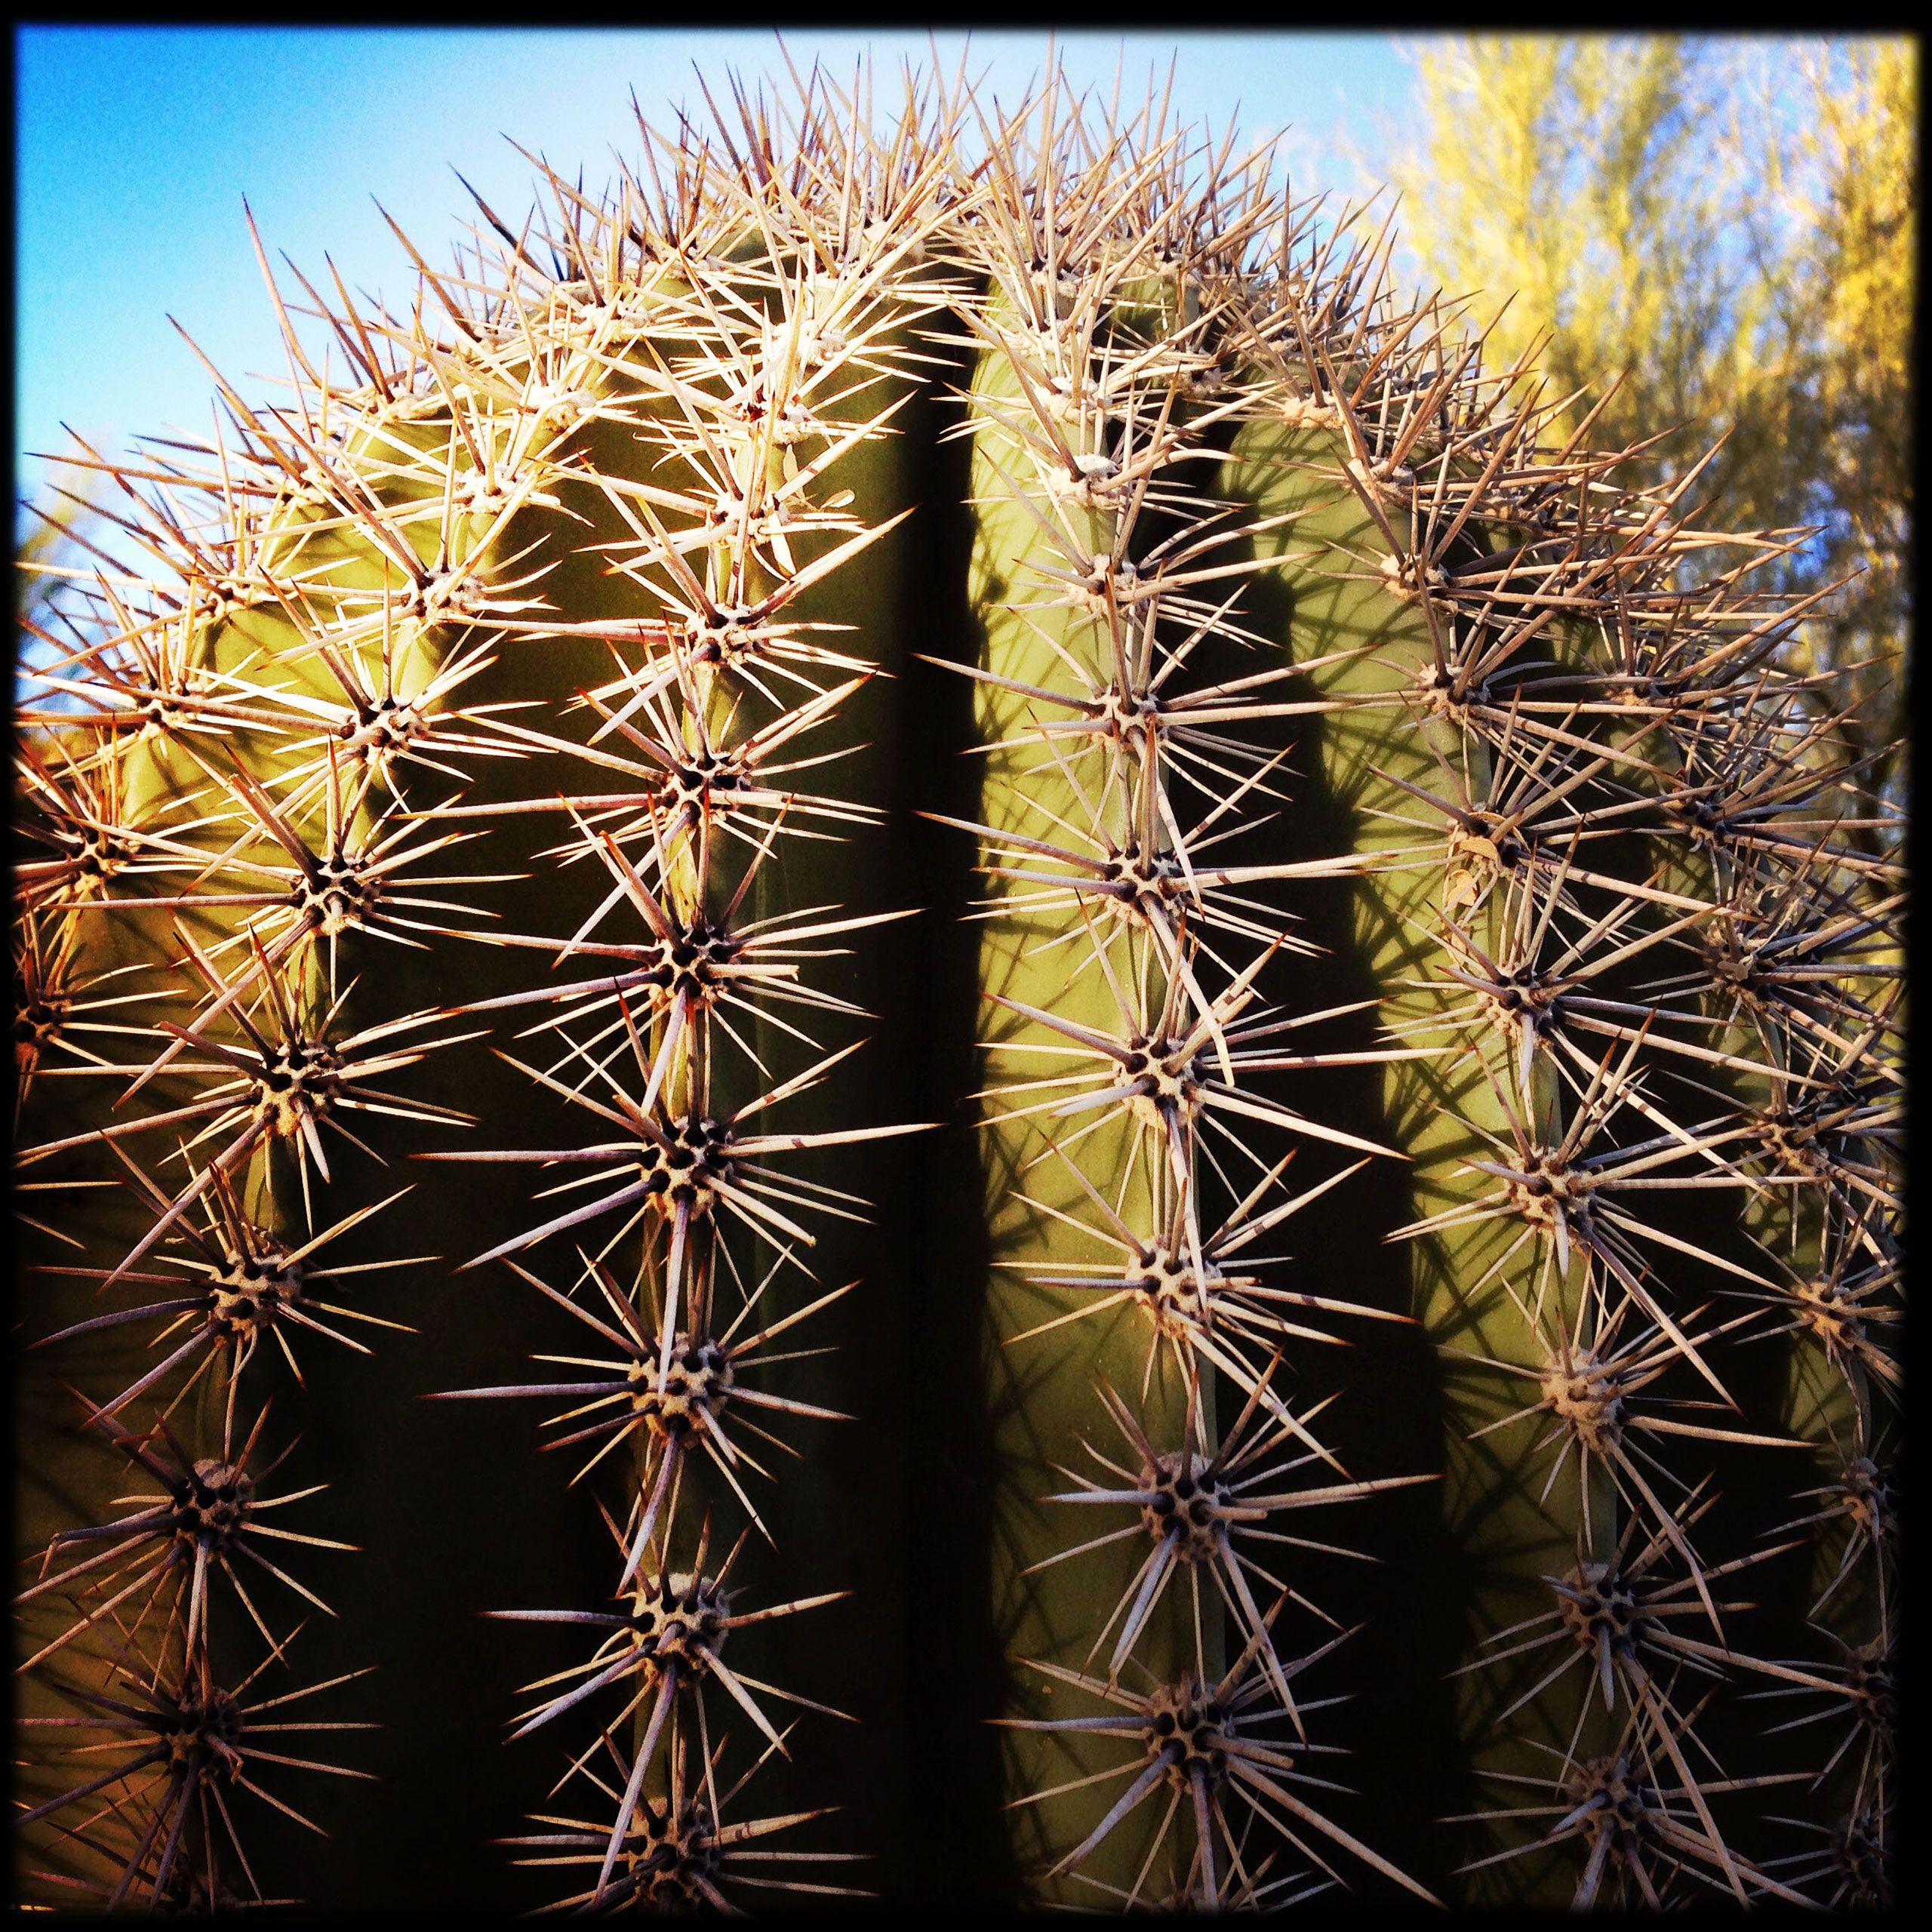 Saguaro cactus detail Scottsdale Arizona